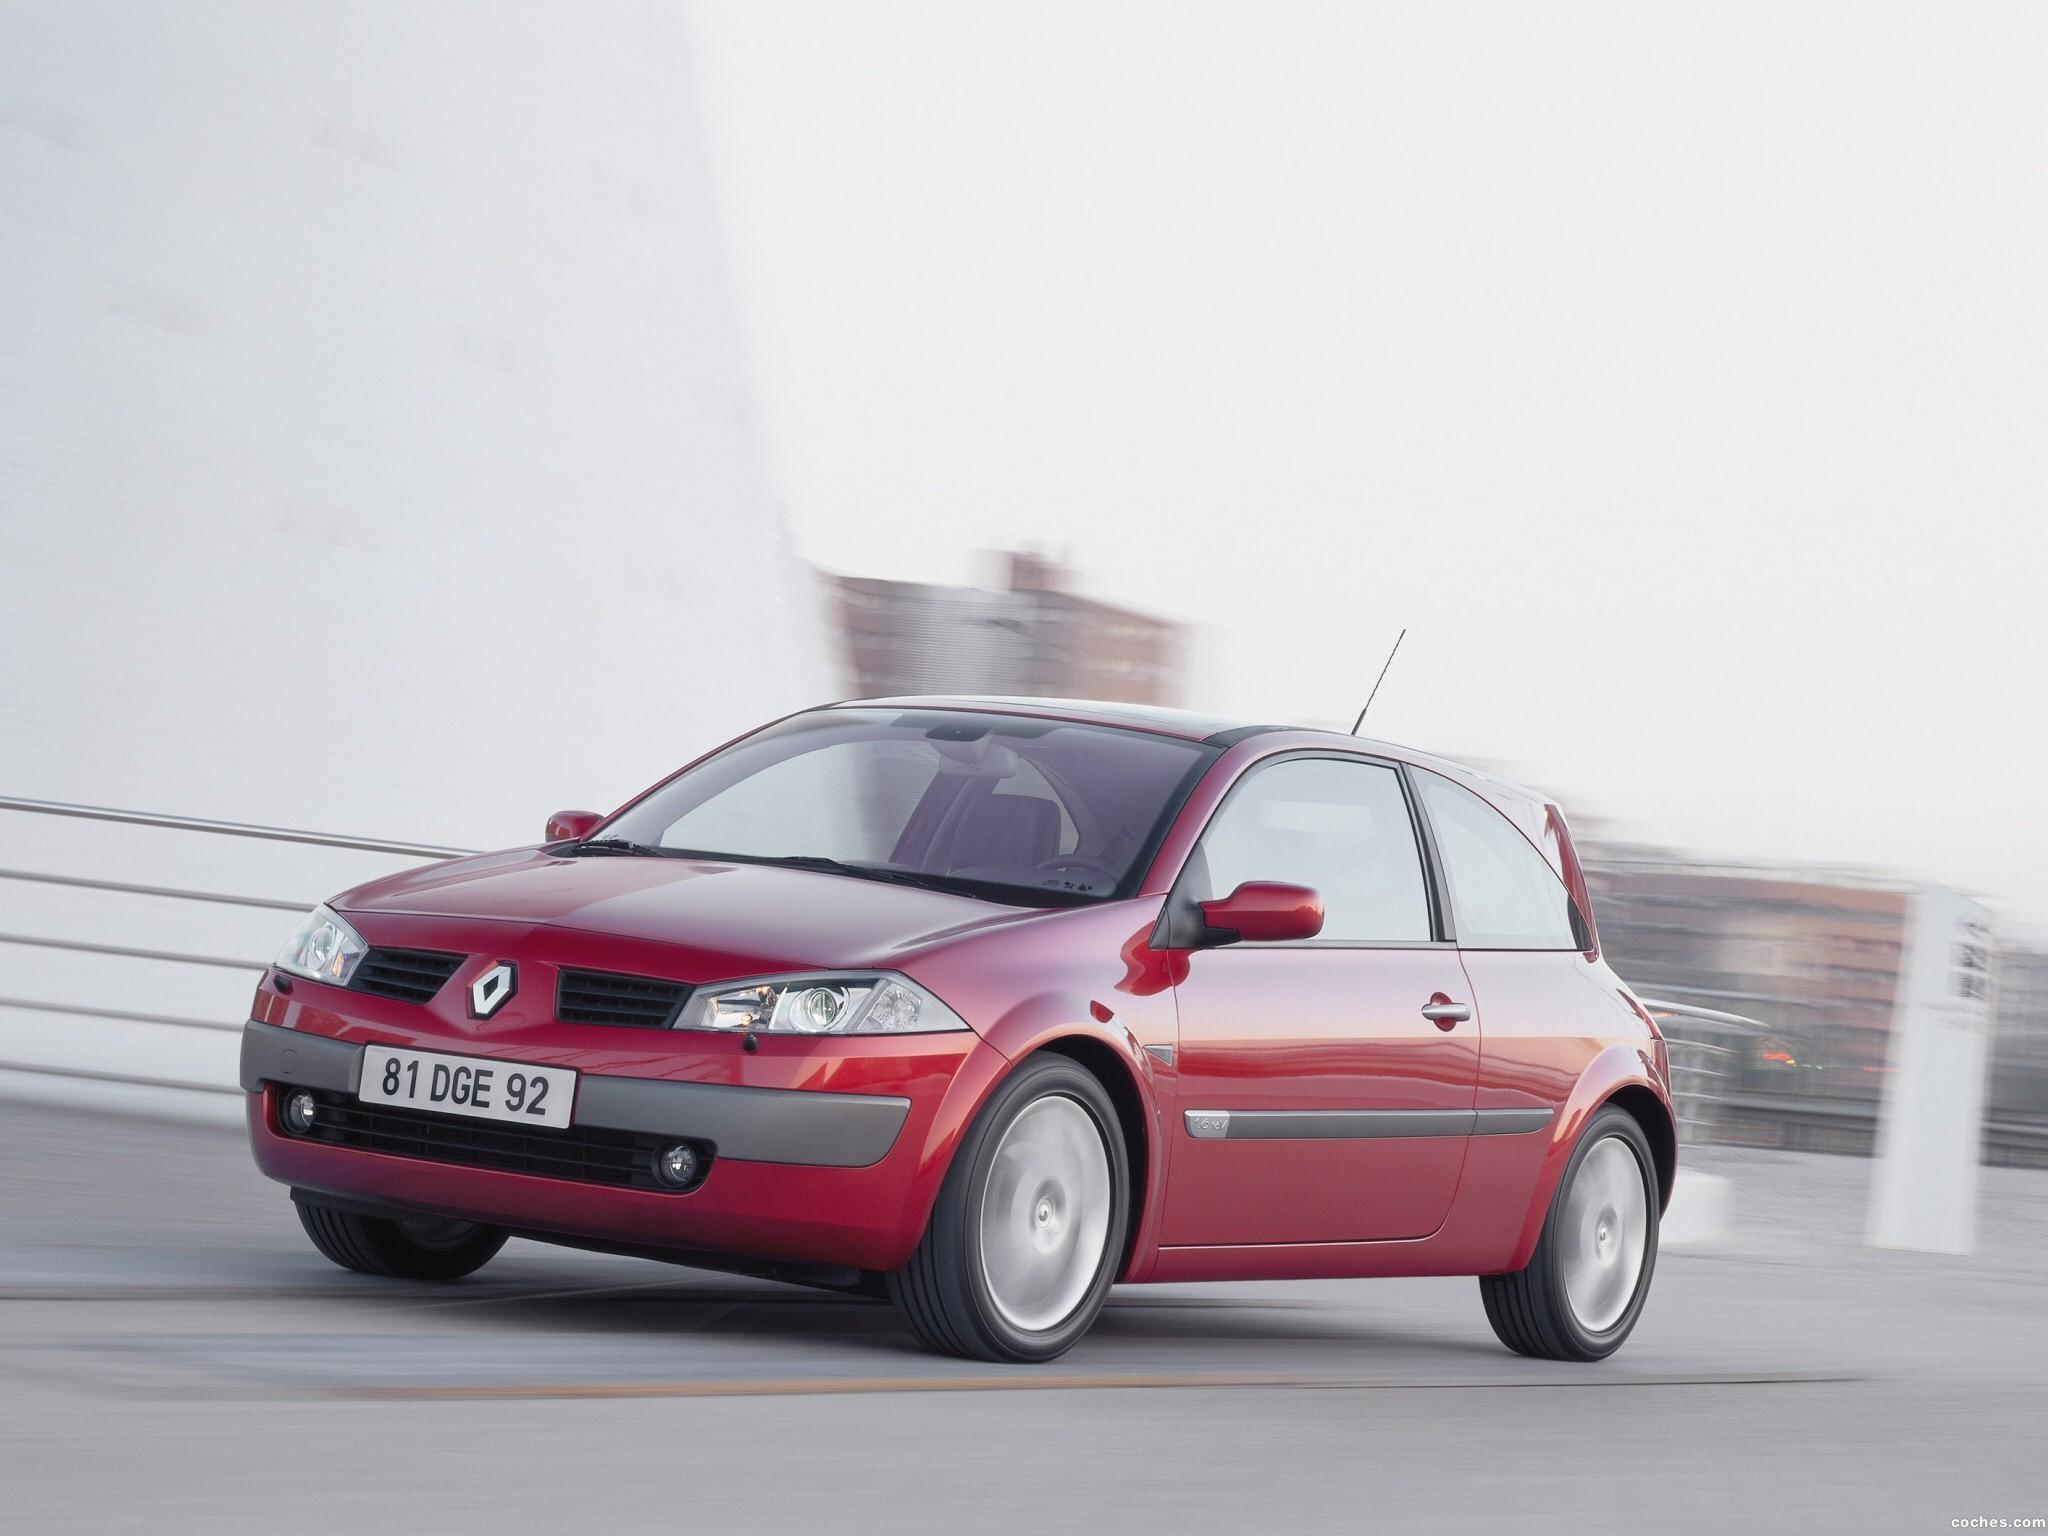 Foto 1 de Renault Megane 3 puertas 2002